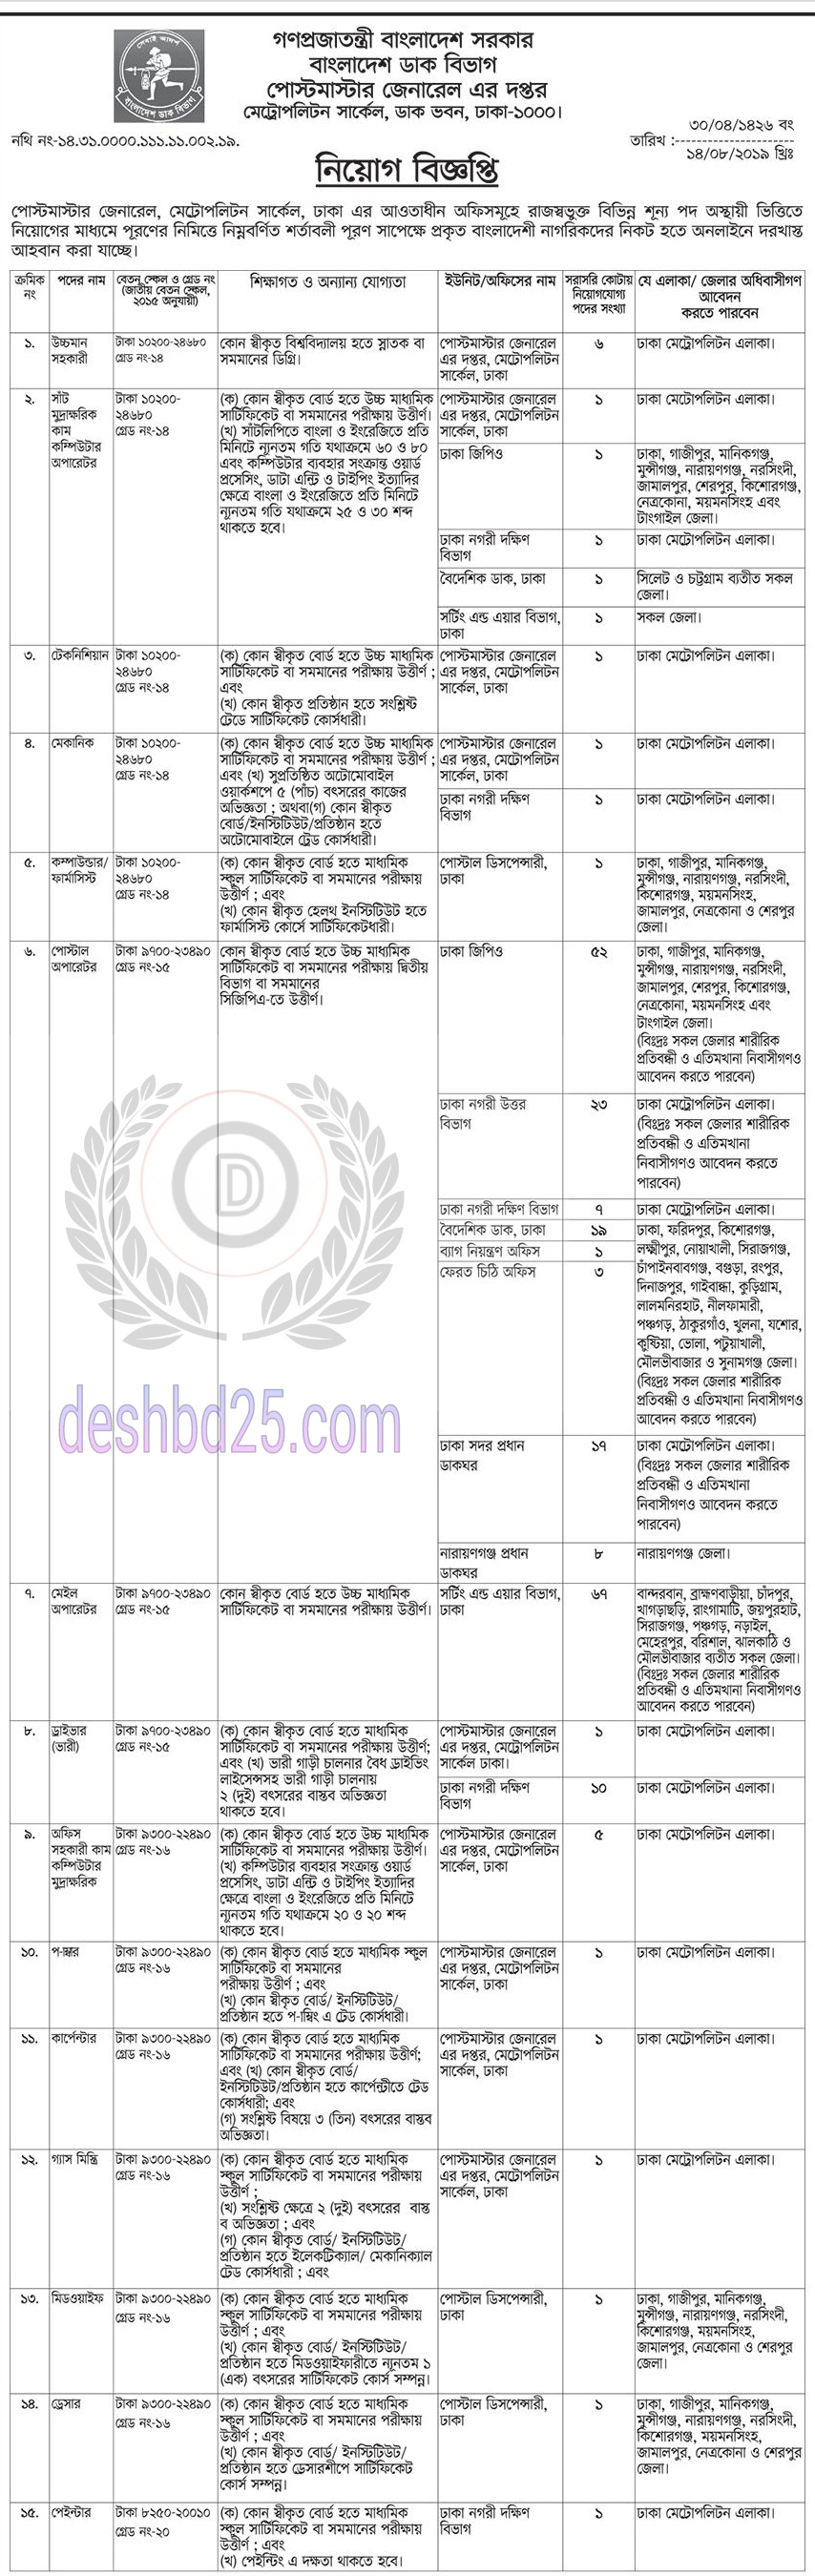 BD Post Office Job Circular